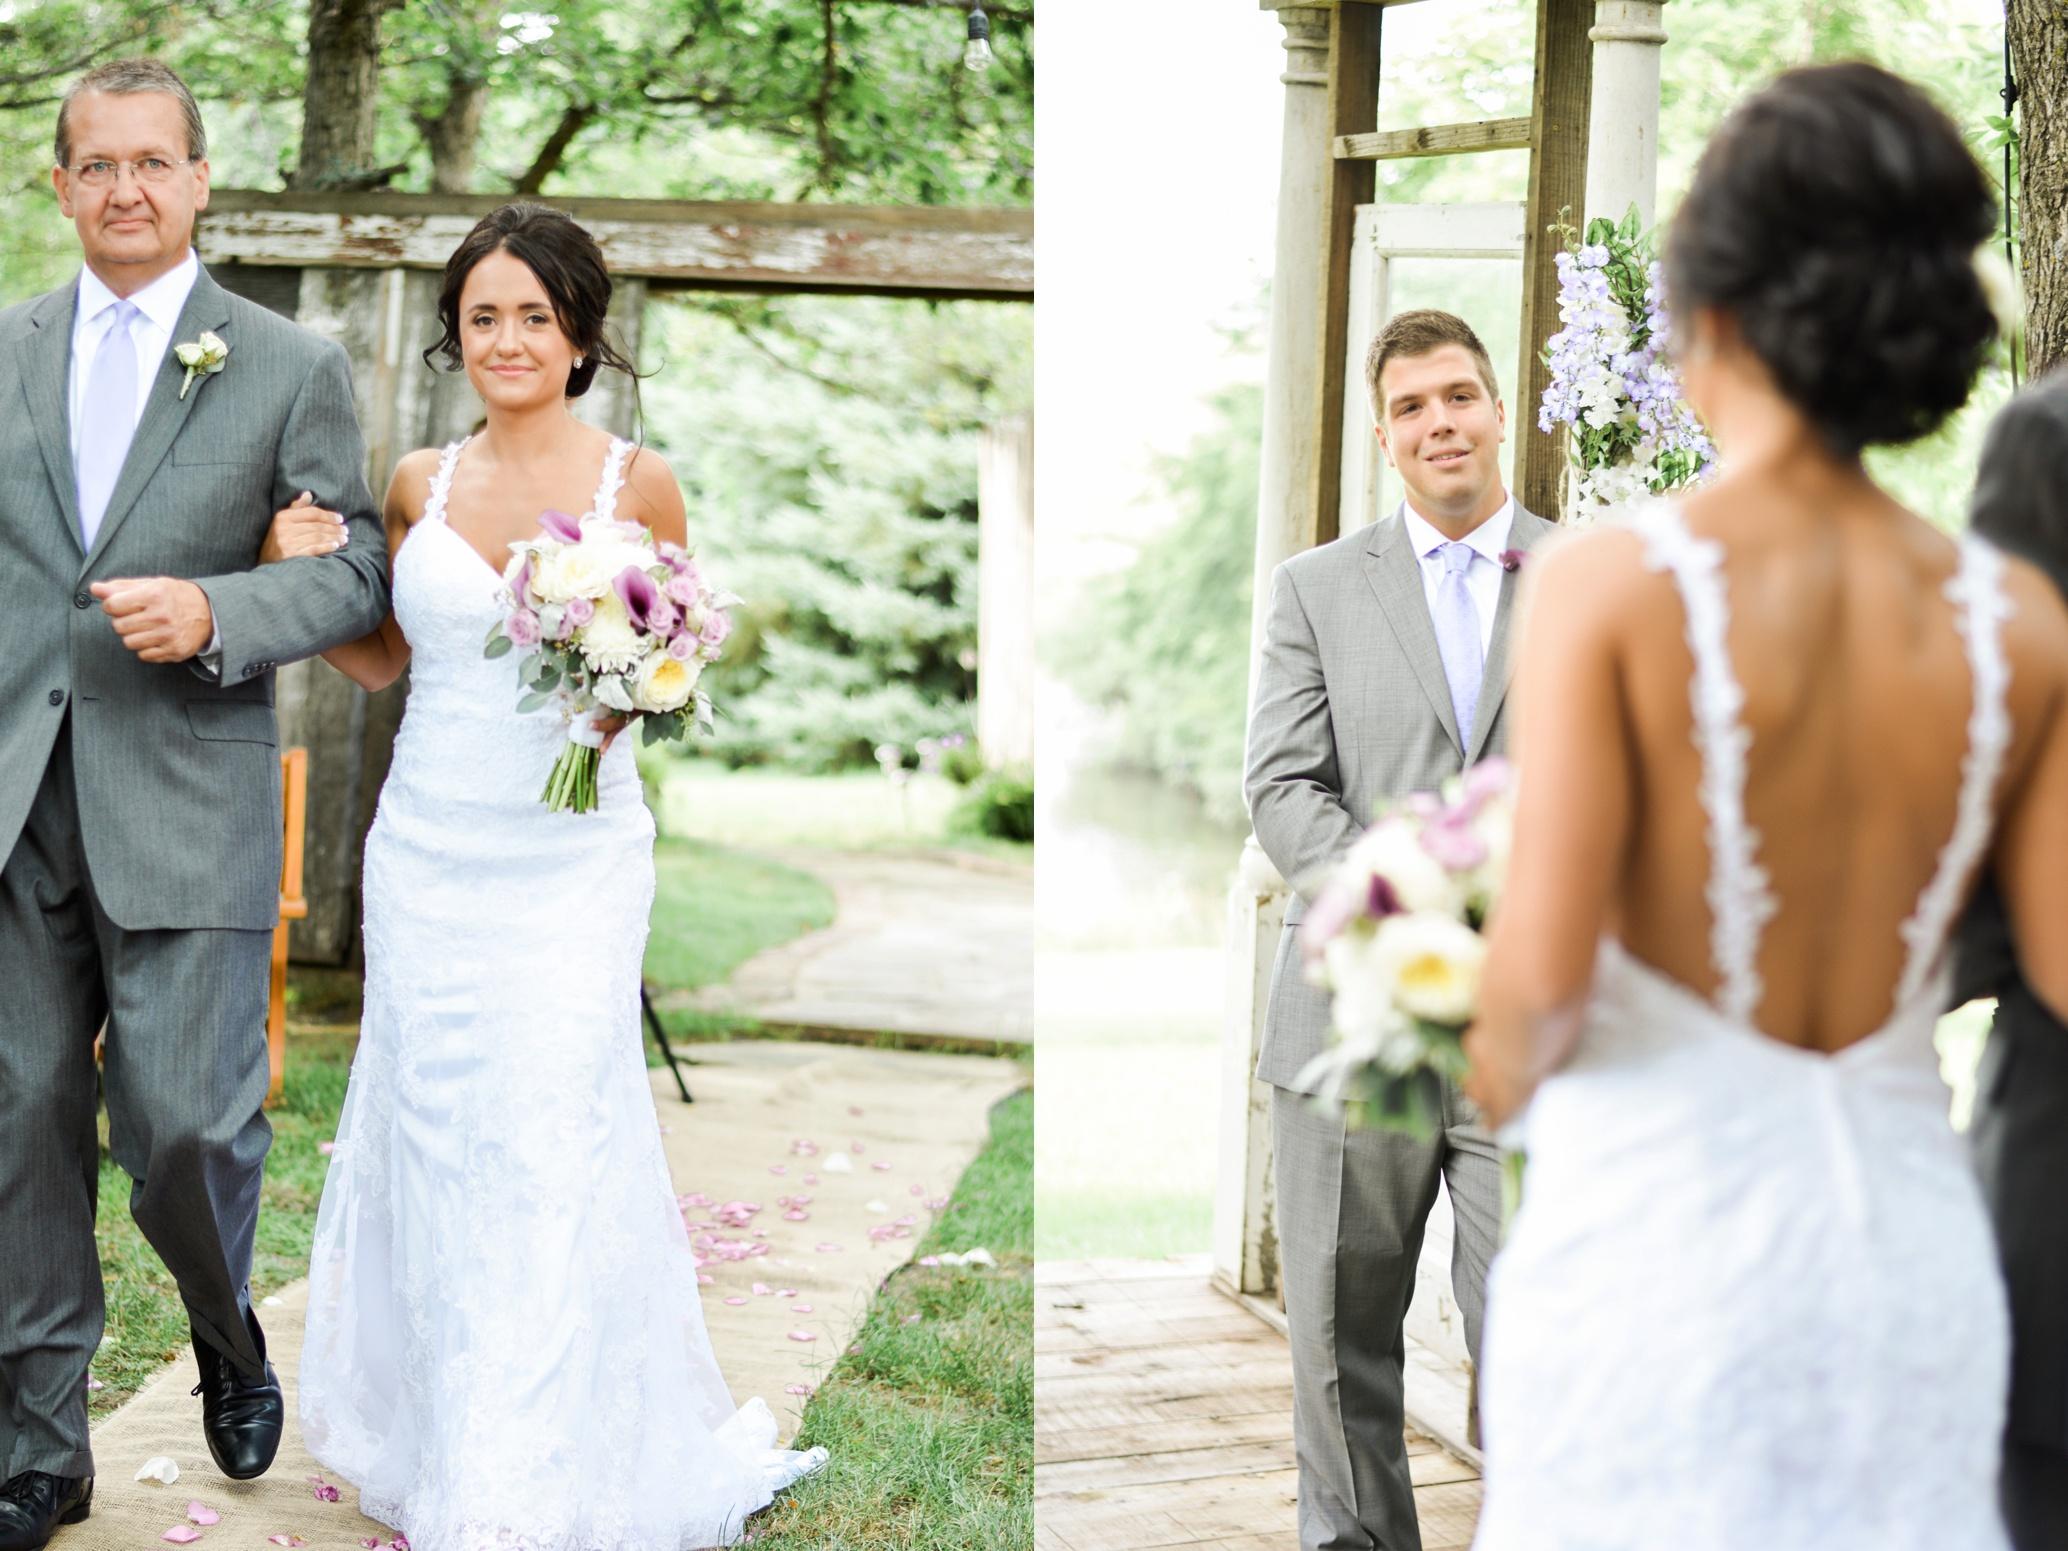 Barnes' Place Rustic Outdoor Wedding | Ali Leigh Photo Minneapolis Wedding Photographer_0112.jpg